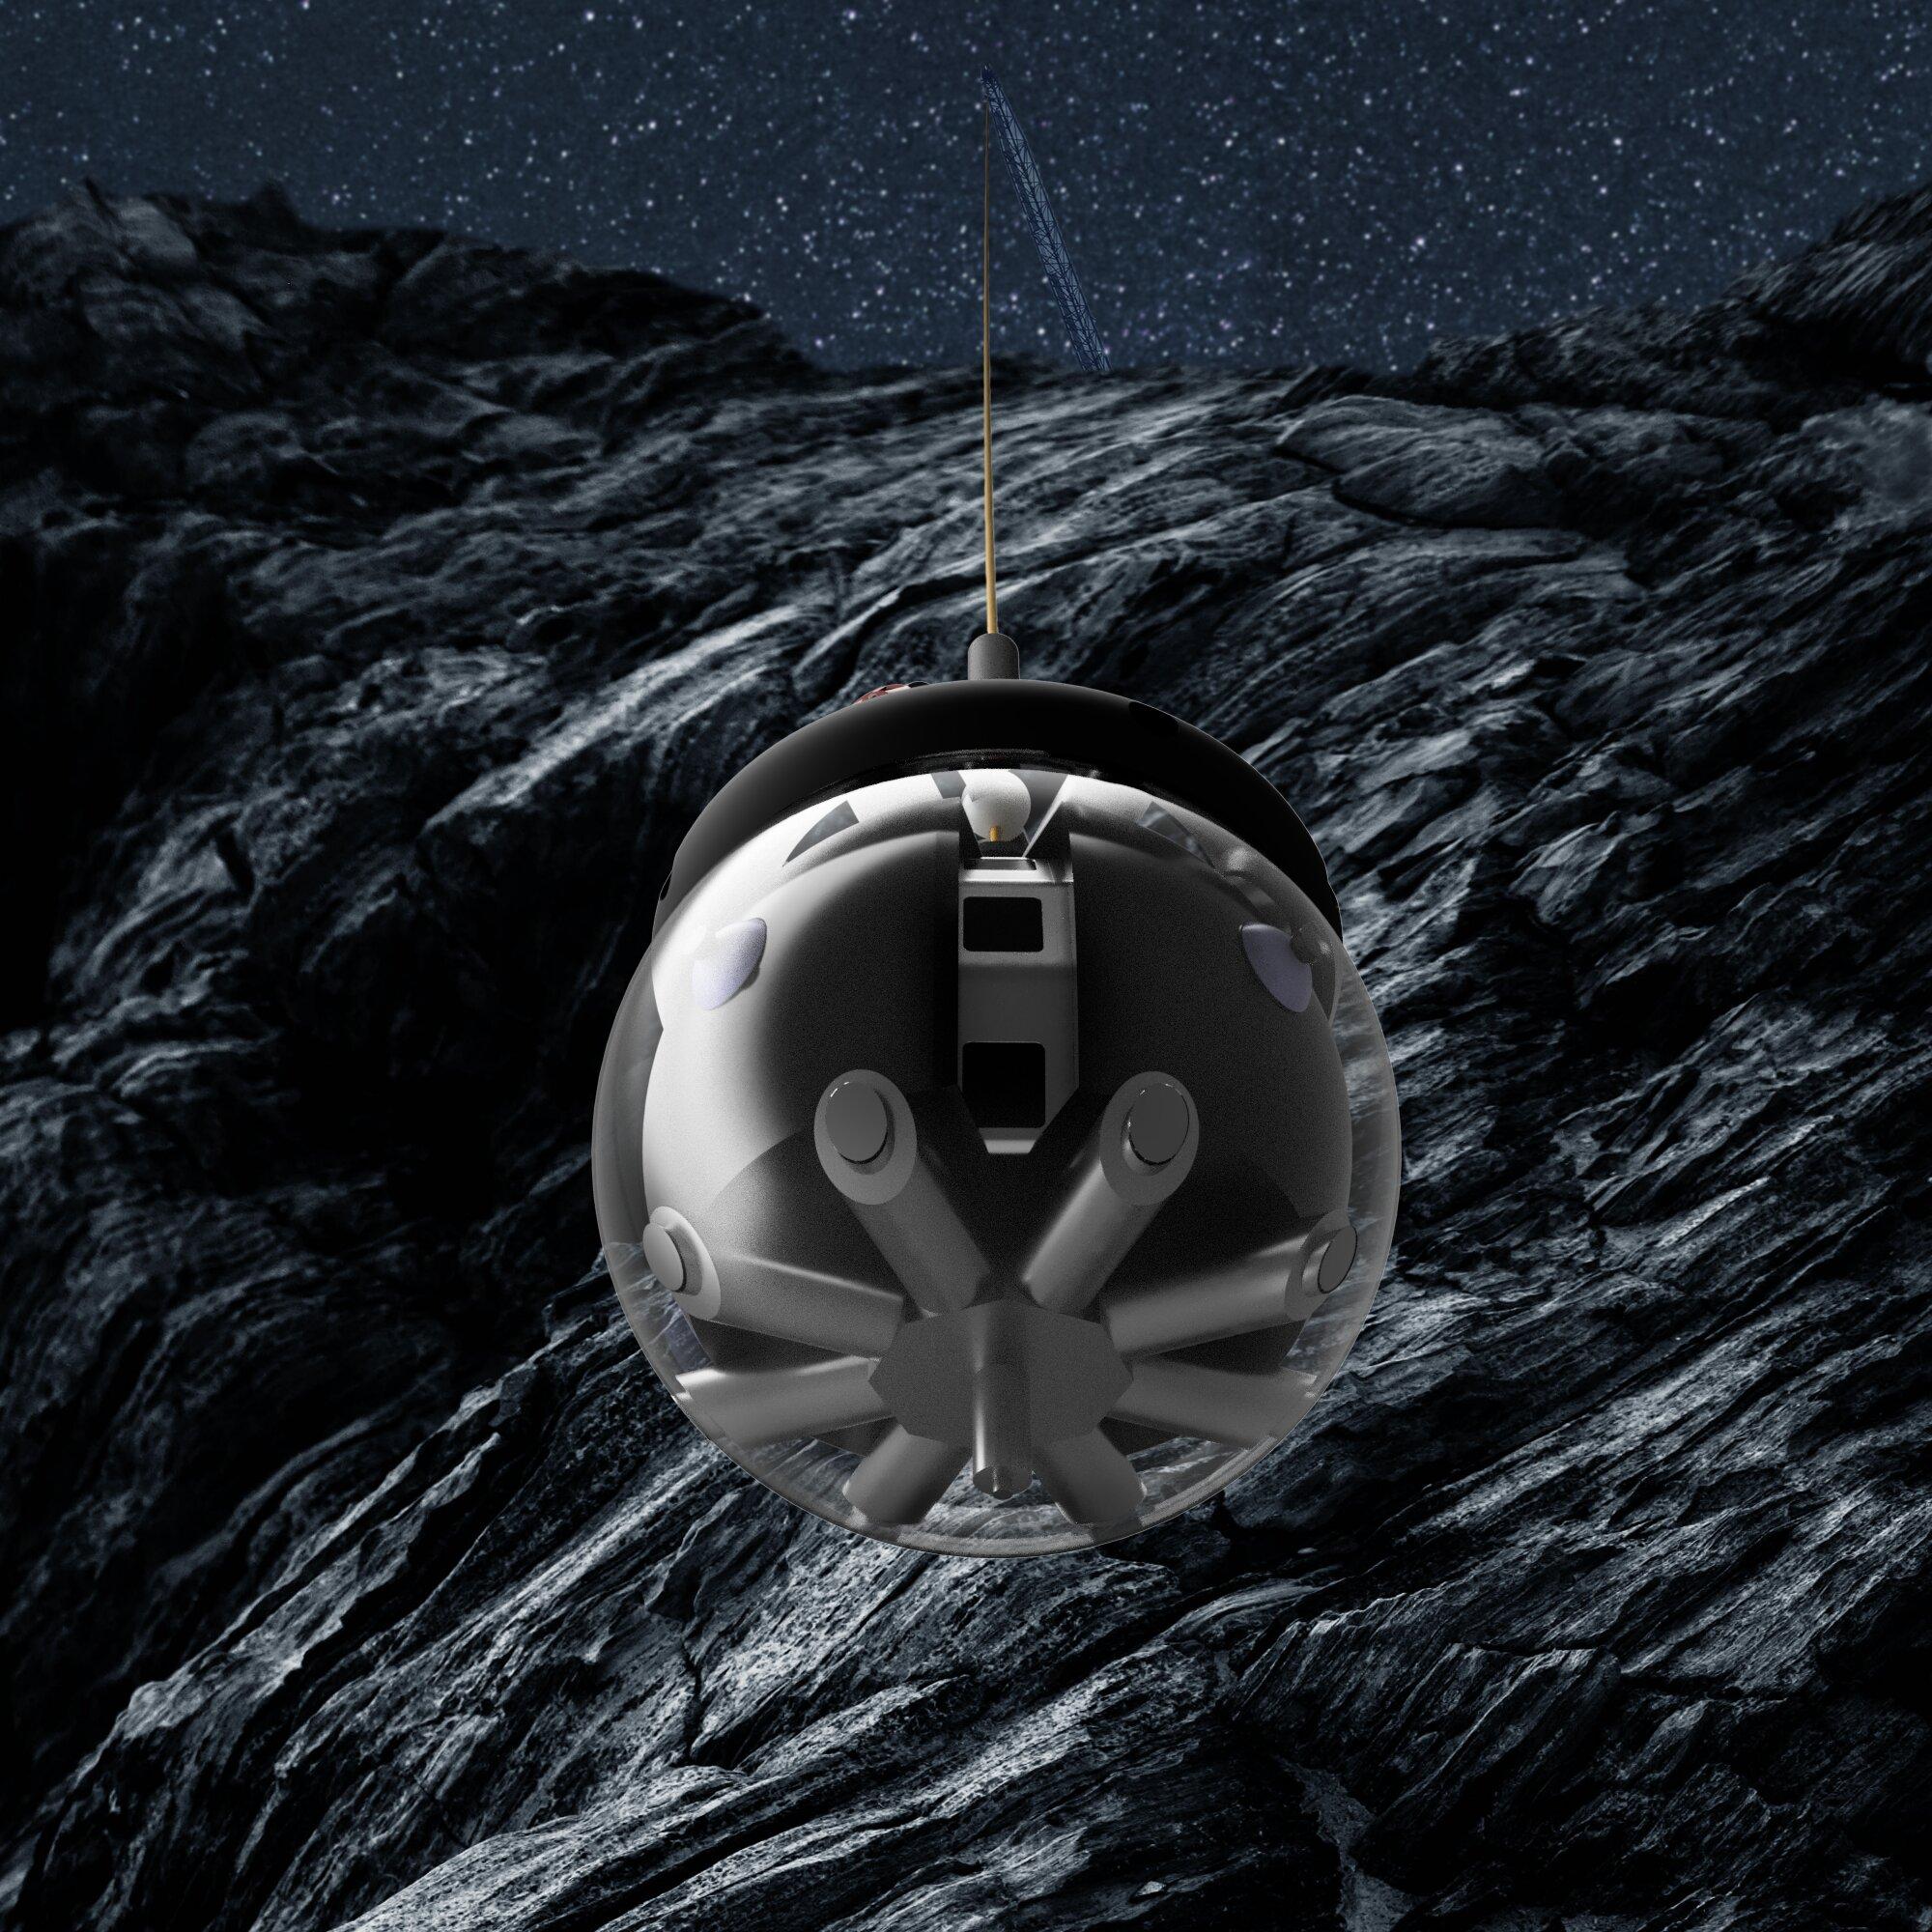 Lunar cave explorer